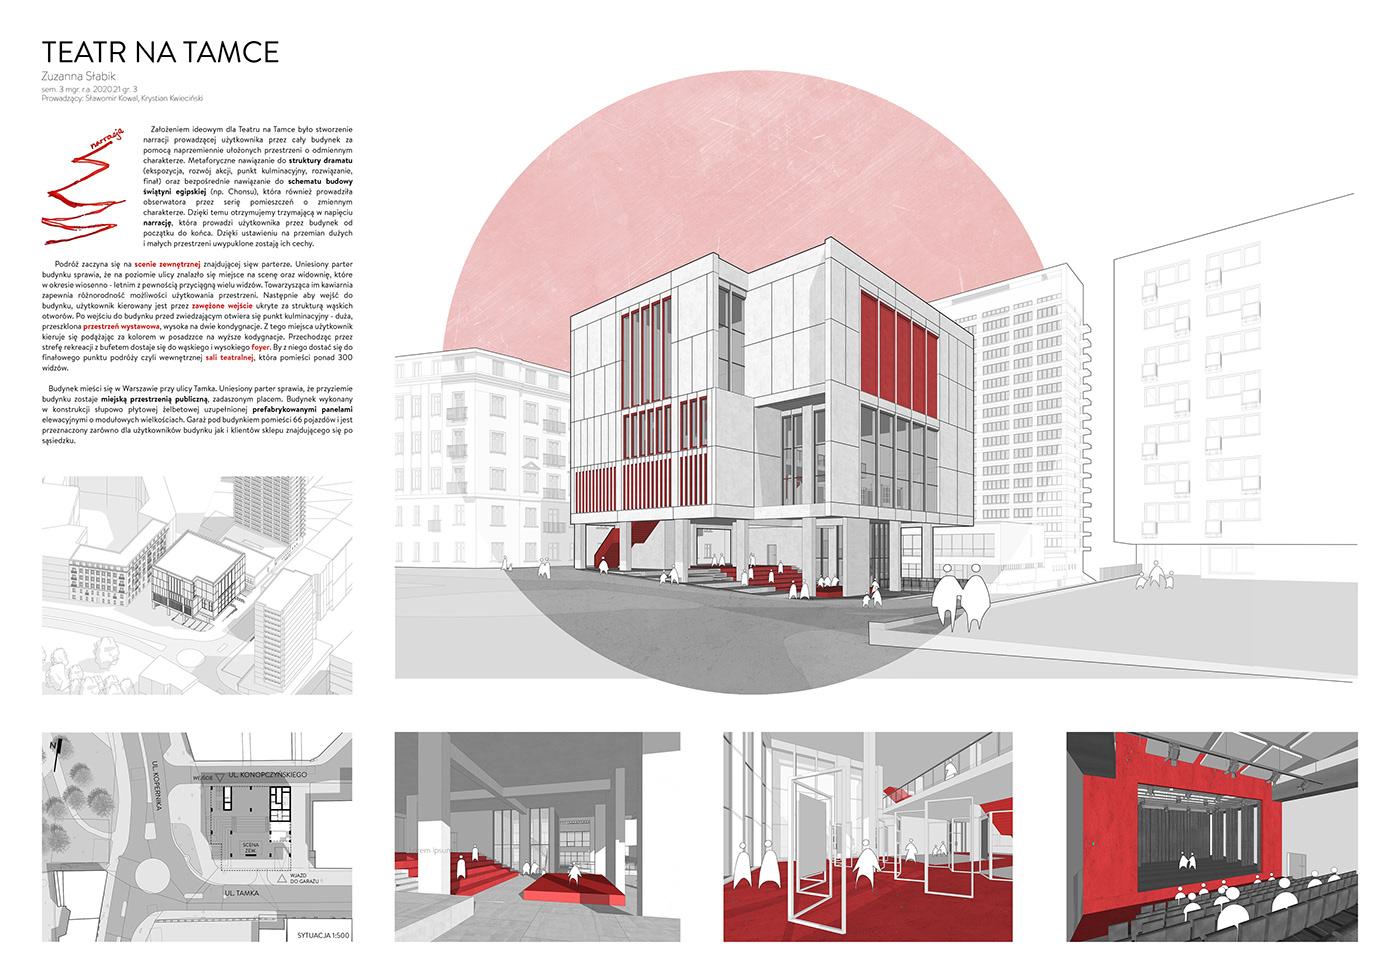 modern building narration design Prefabrication theater  theater architecture Theater Design